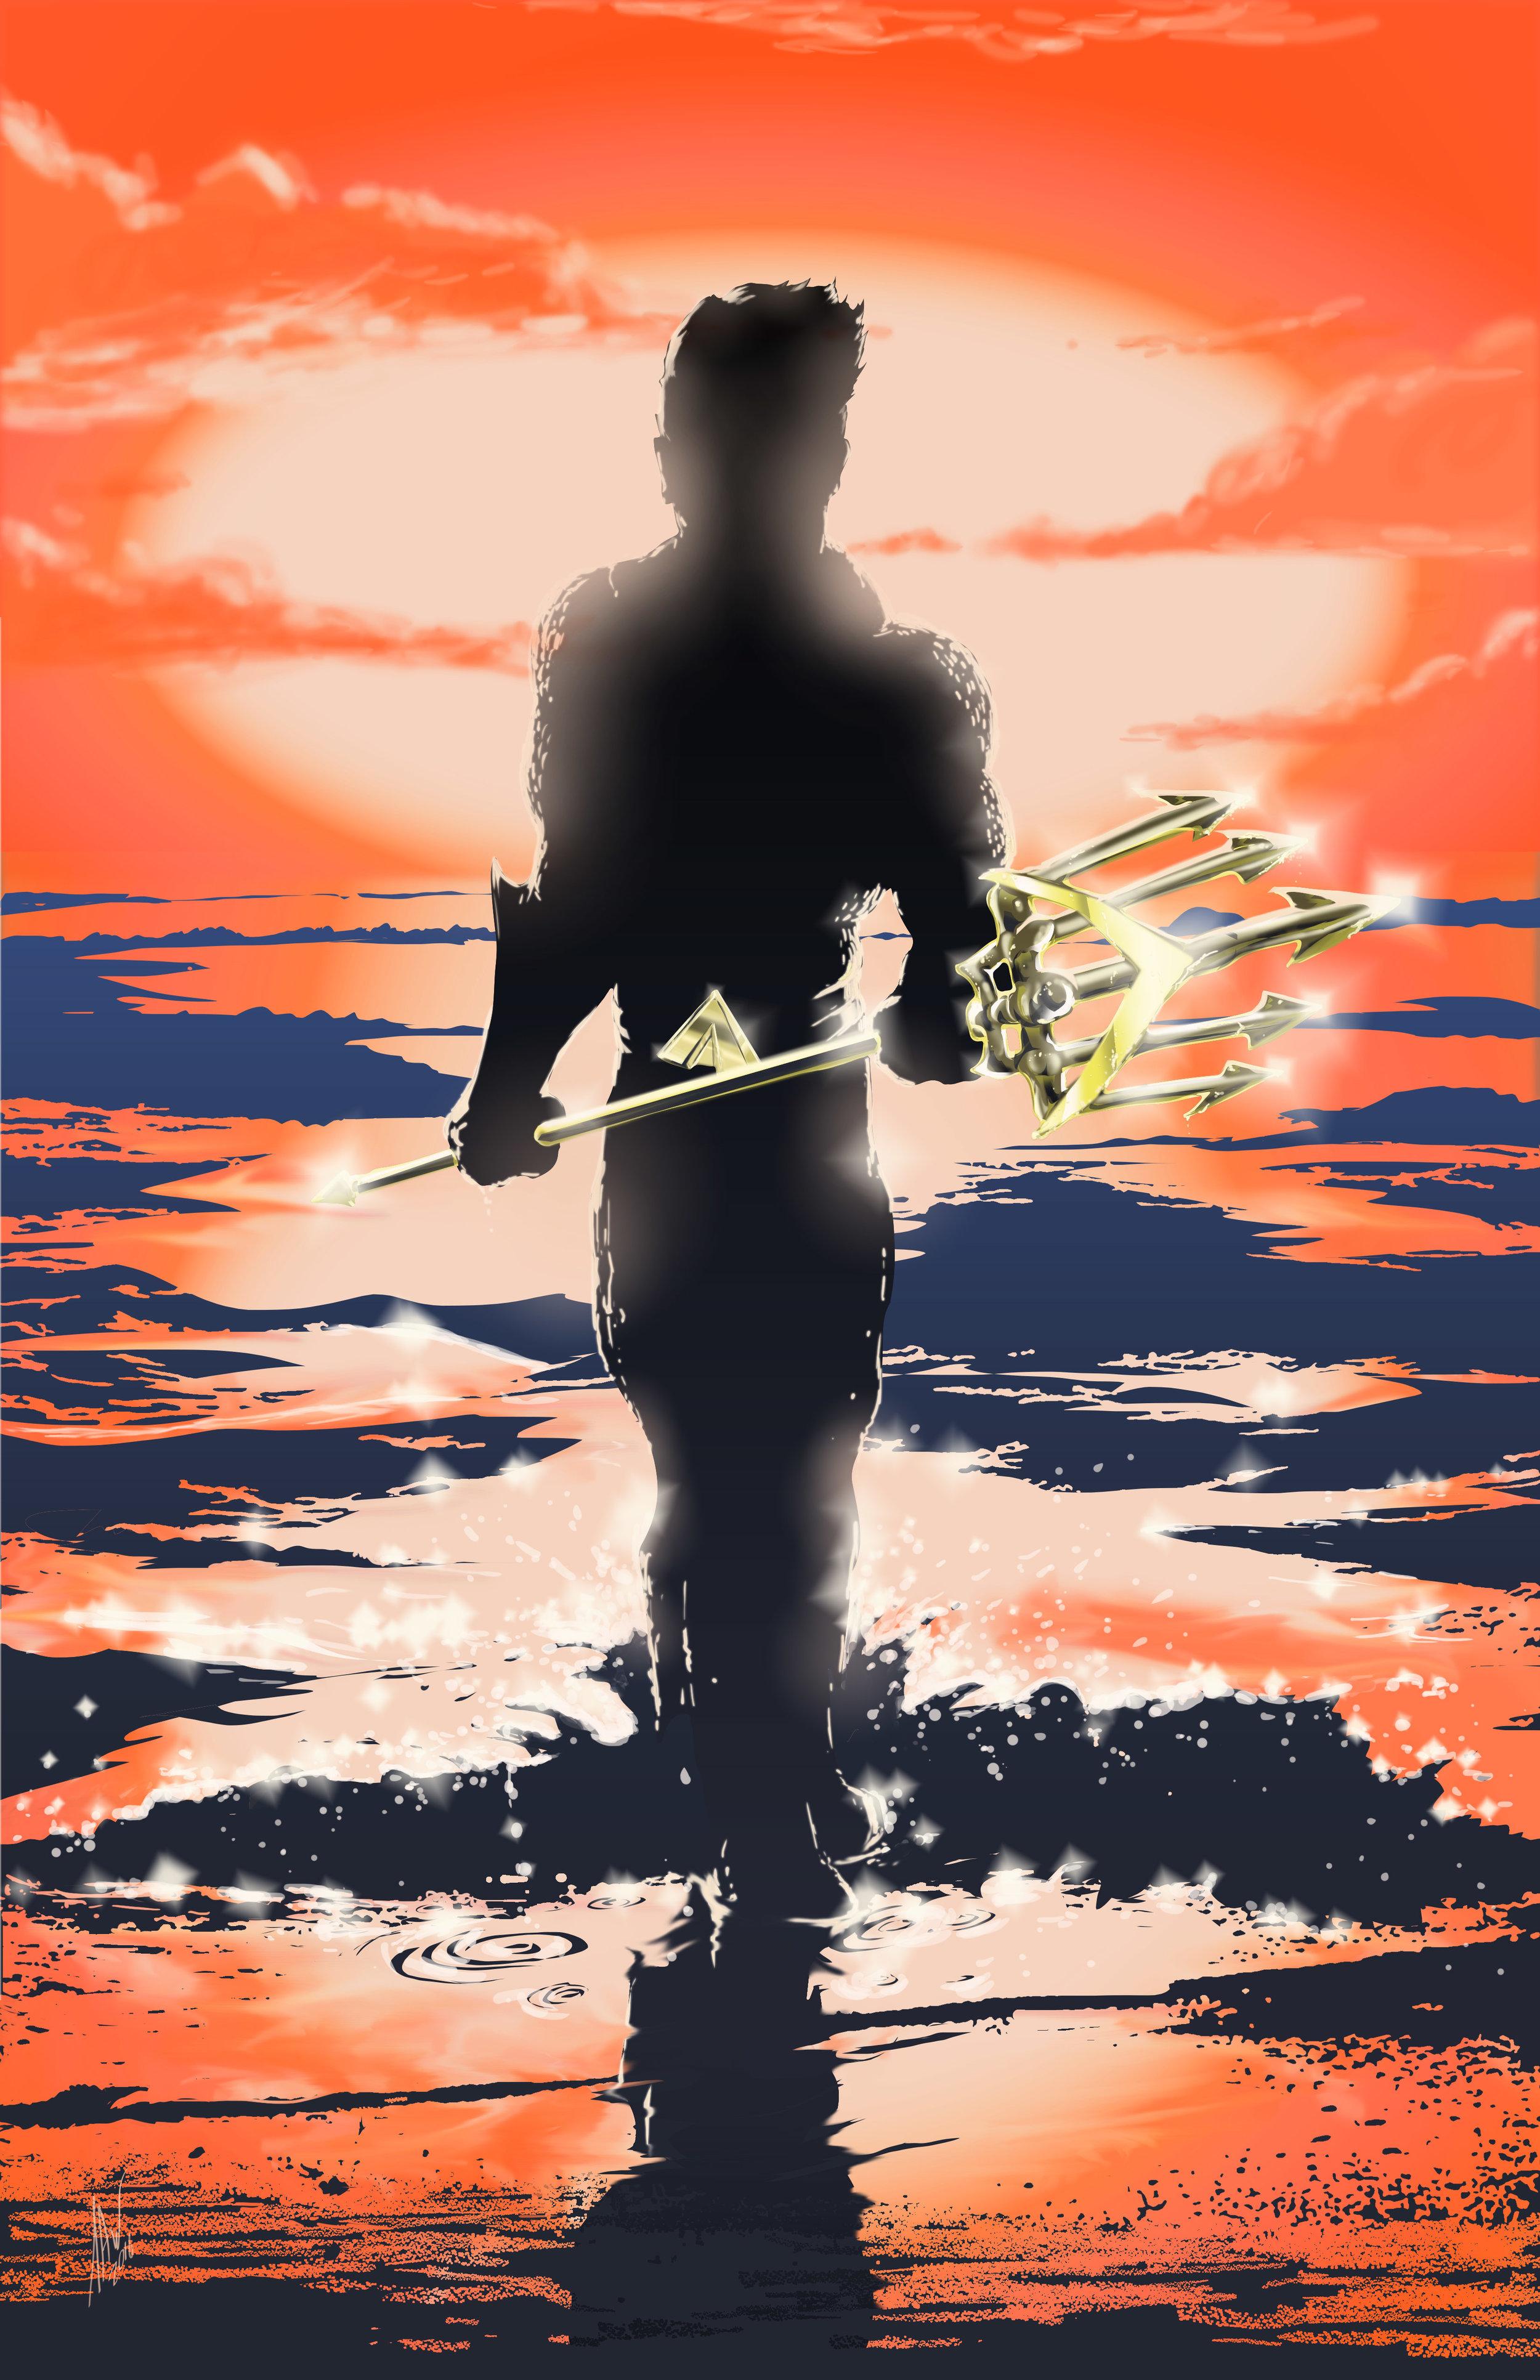 Aquaman - King of the Seas